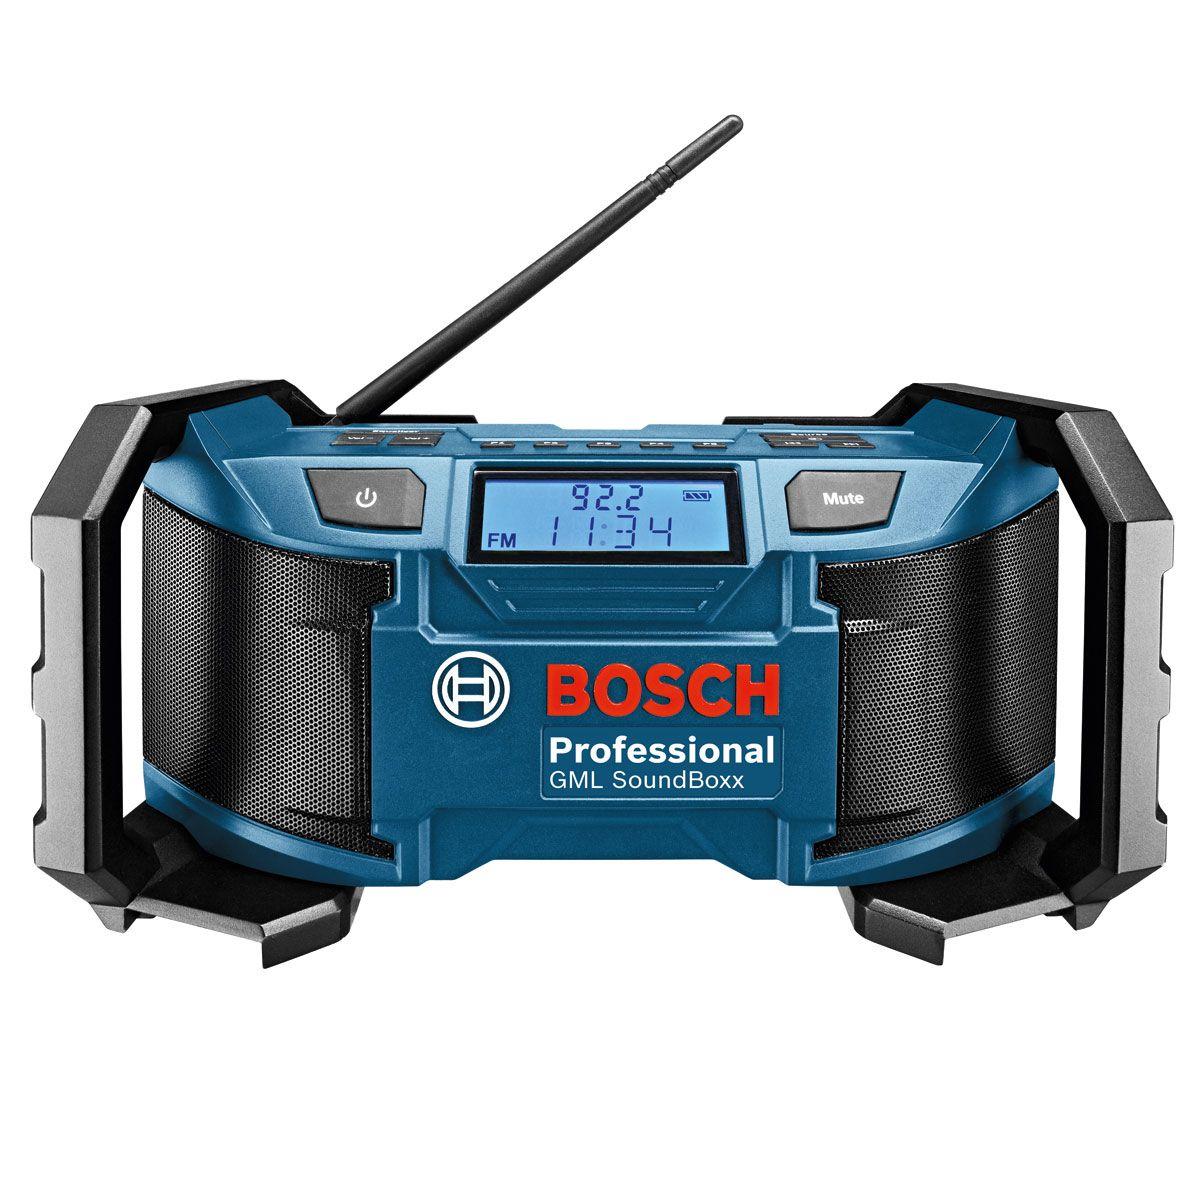 Bosch Gml Soundboxx Jobsite Radio Radio Bosch Fm Radio